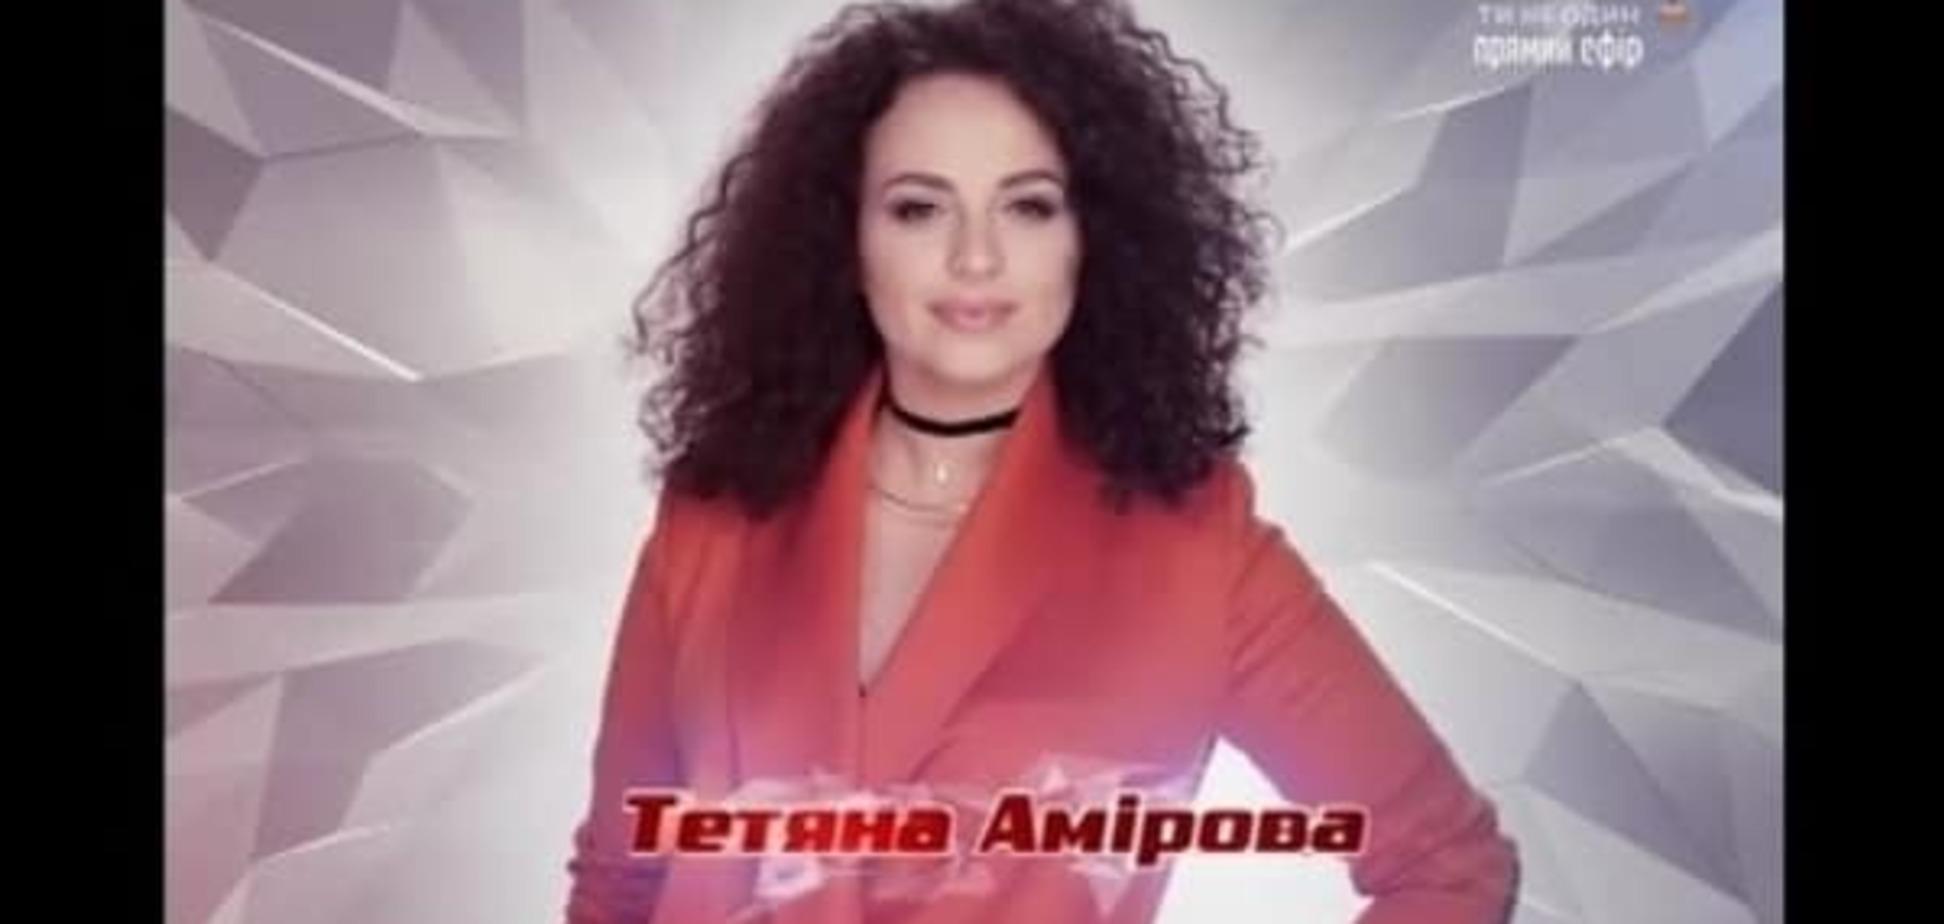 Татьяна Амирова 'За хмарами'